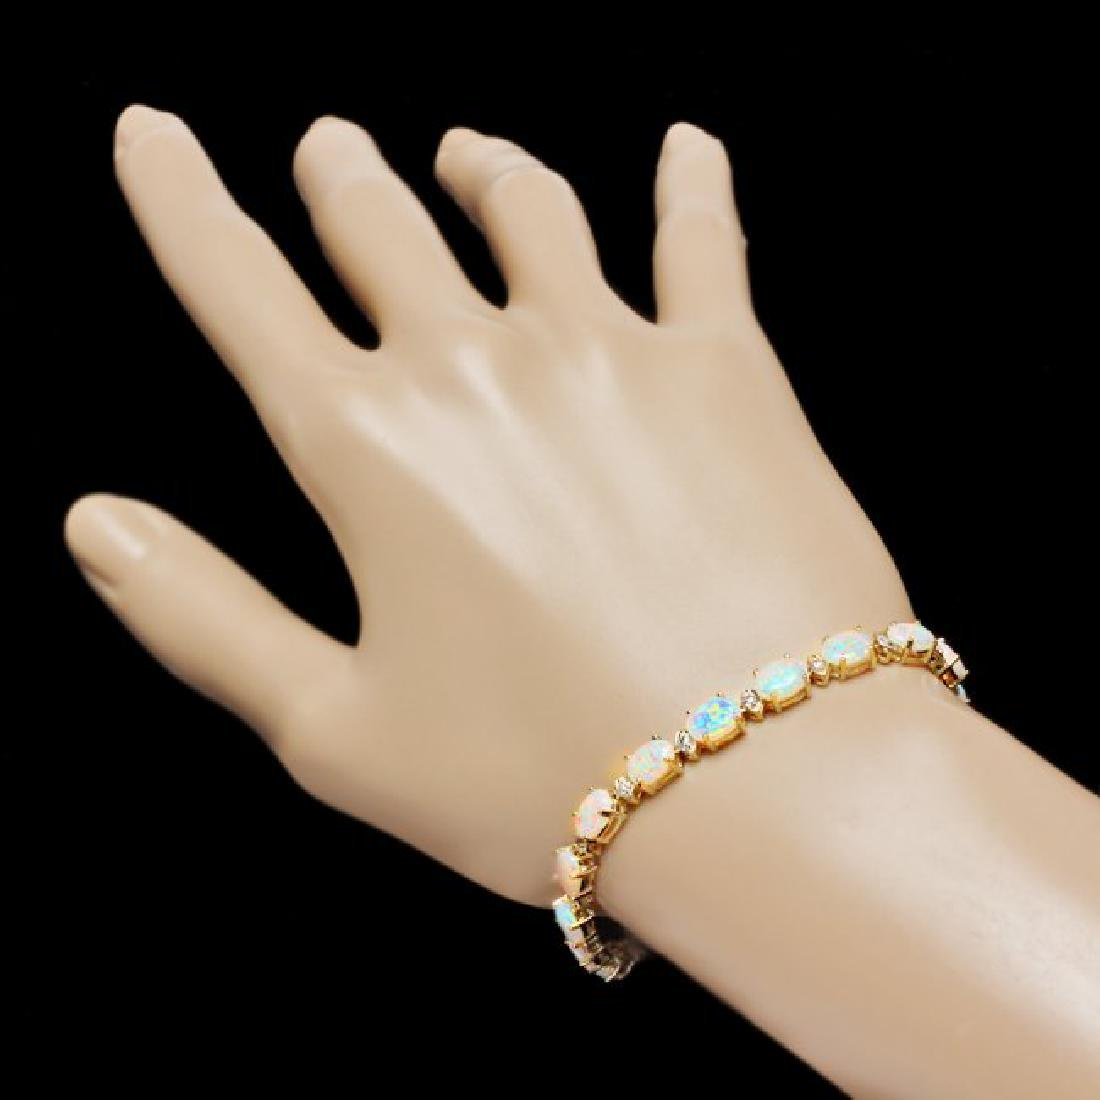 14k Gold 8.20ct Opal 0.70ct Diamond Bracelet - 4